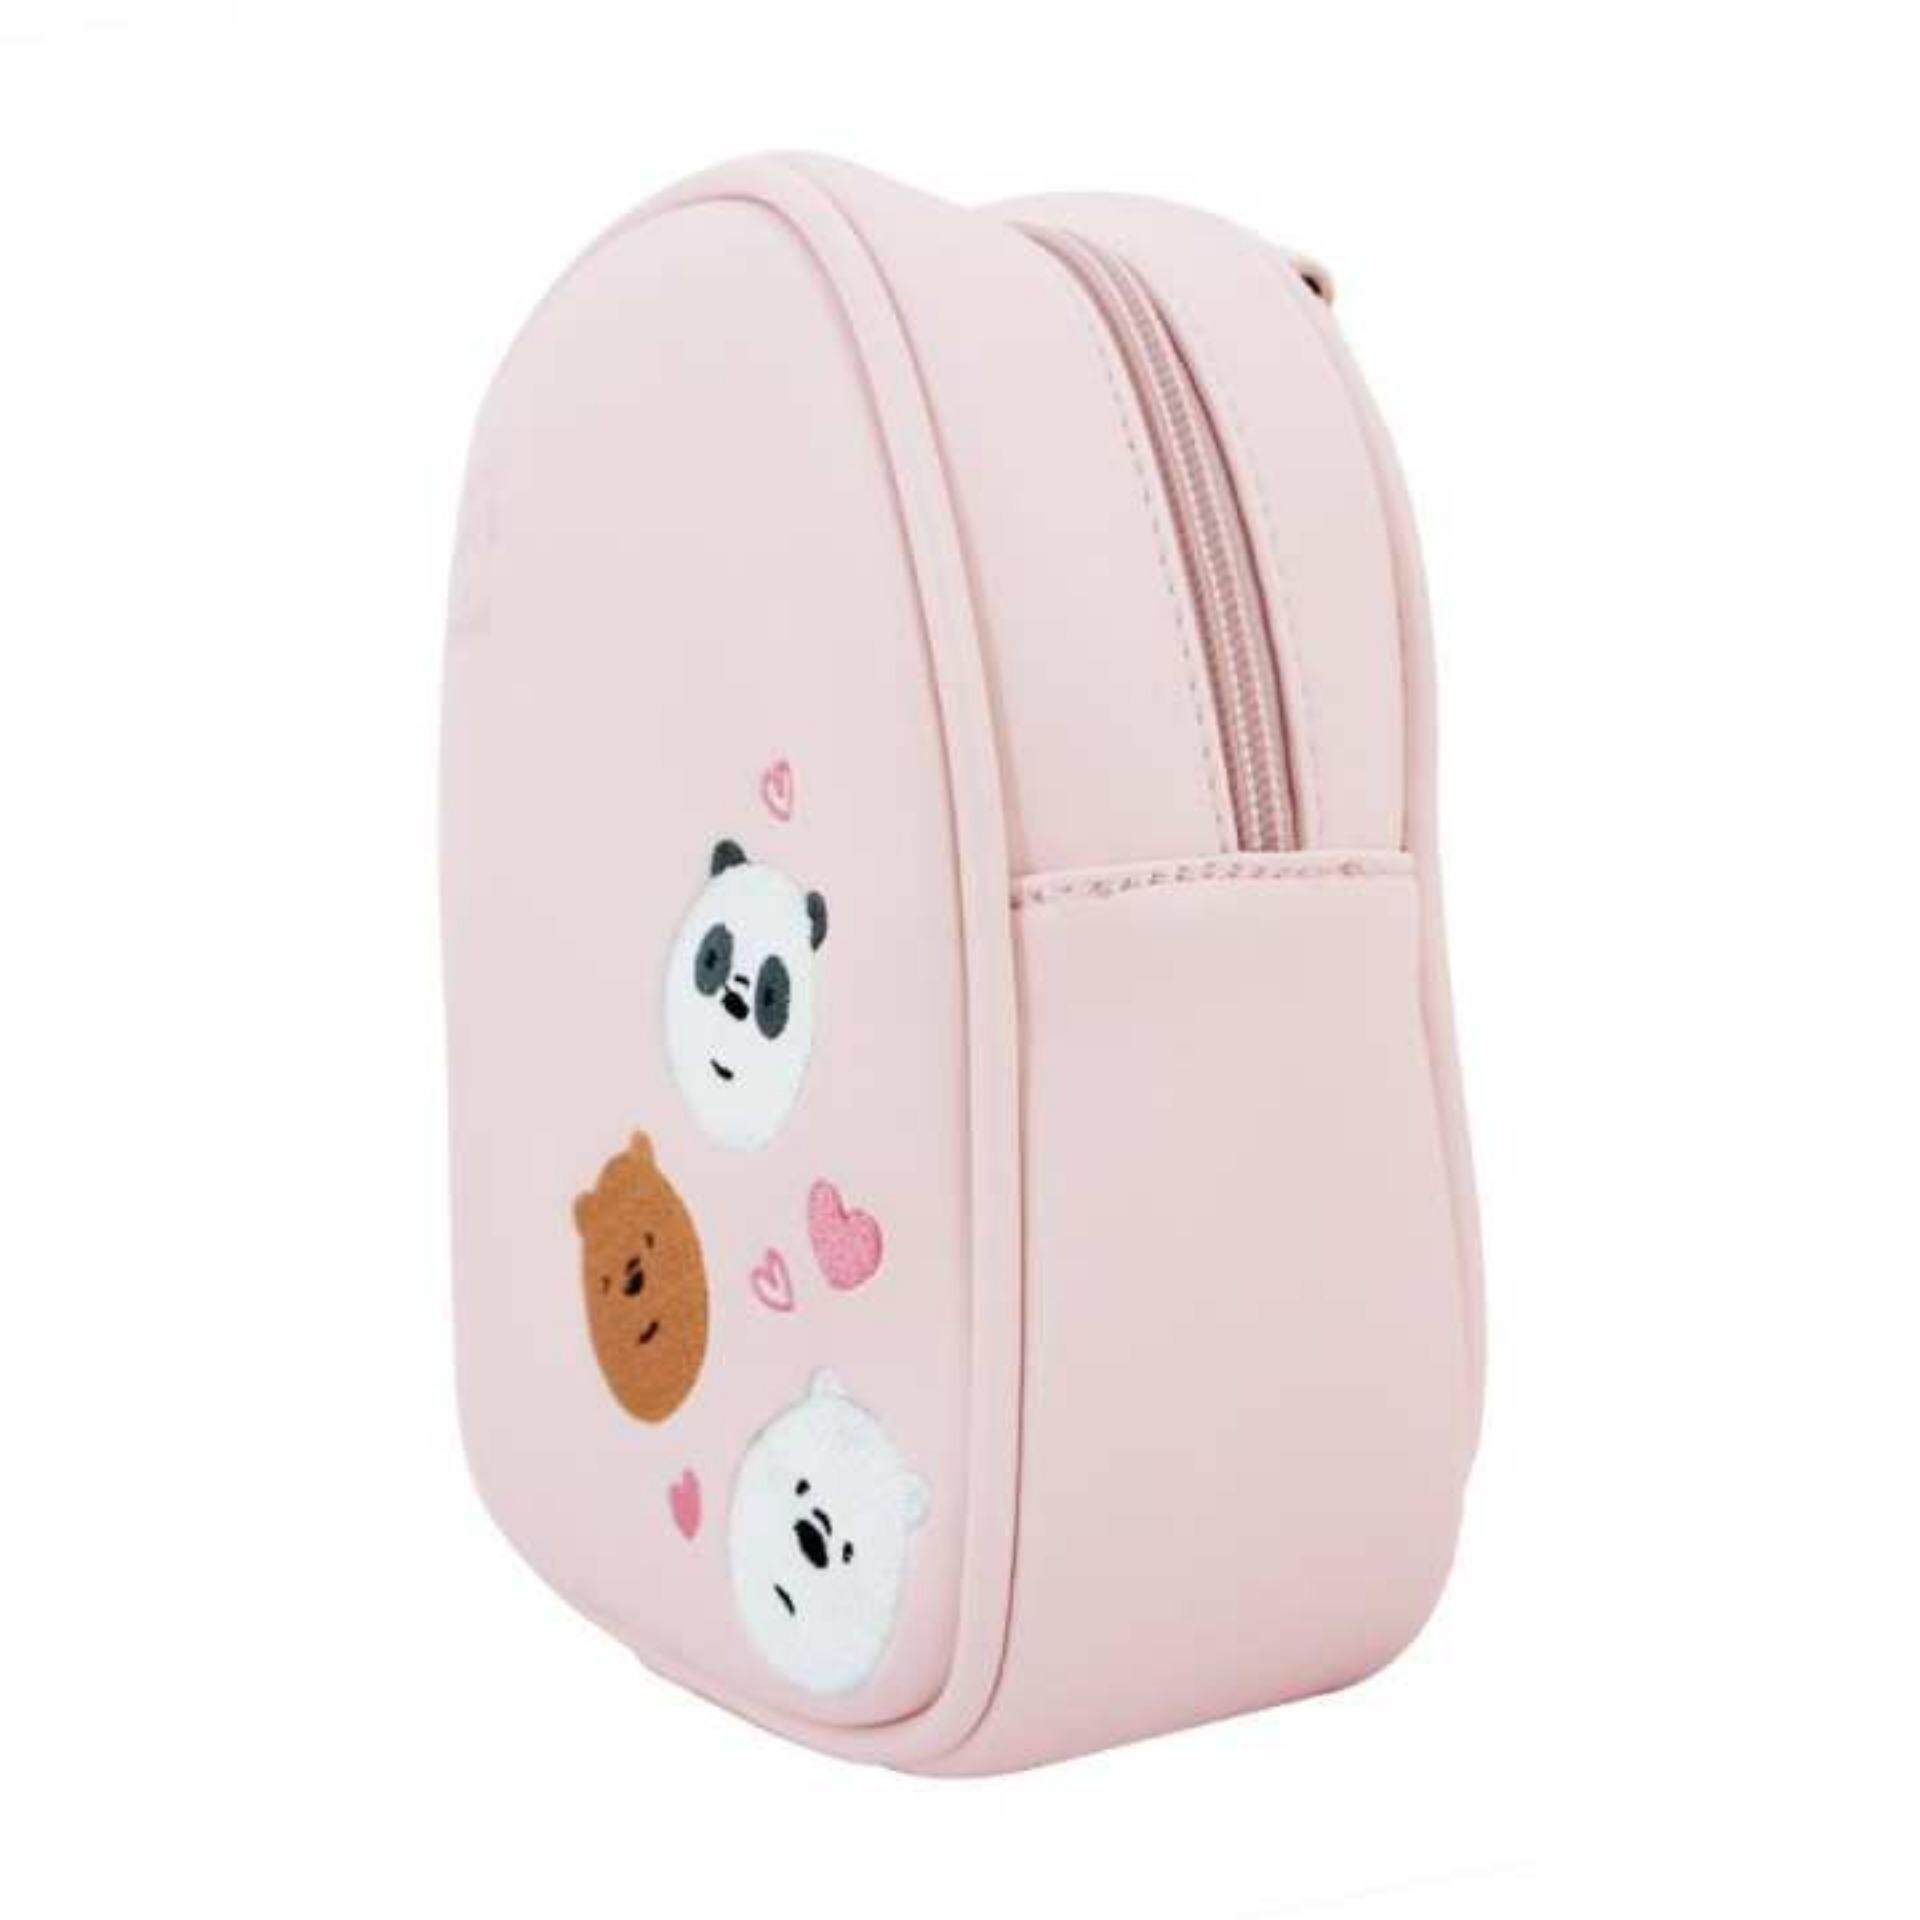 We Bare Bears Crossed Body Bag 7.5 Inches - Sakura Colour